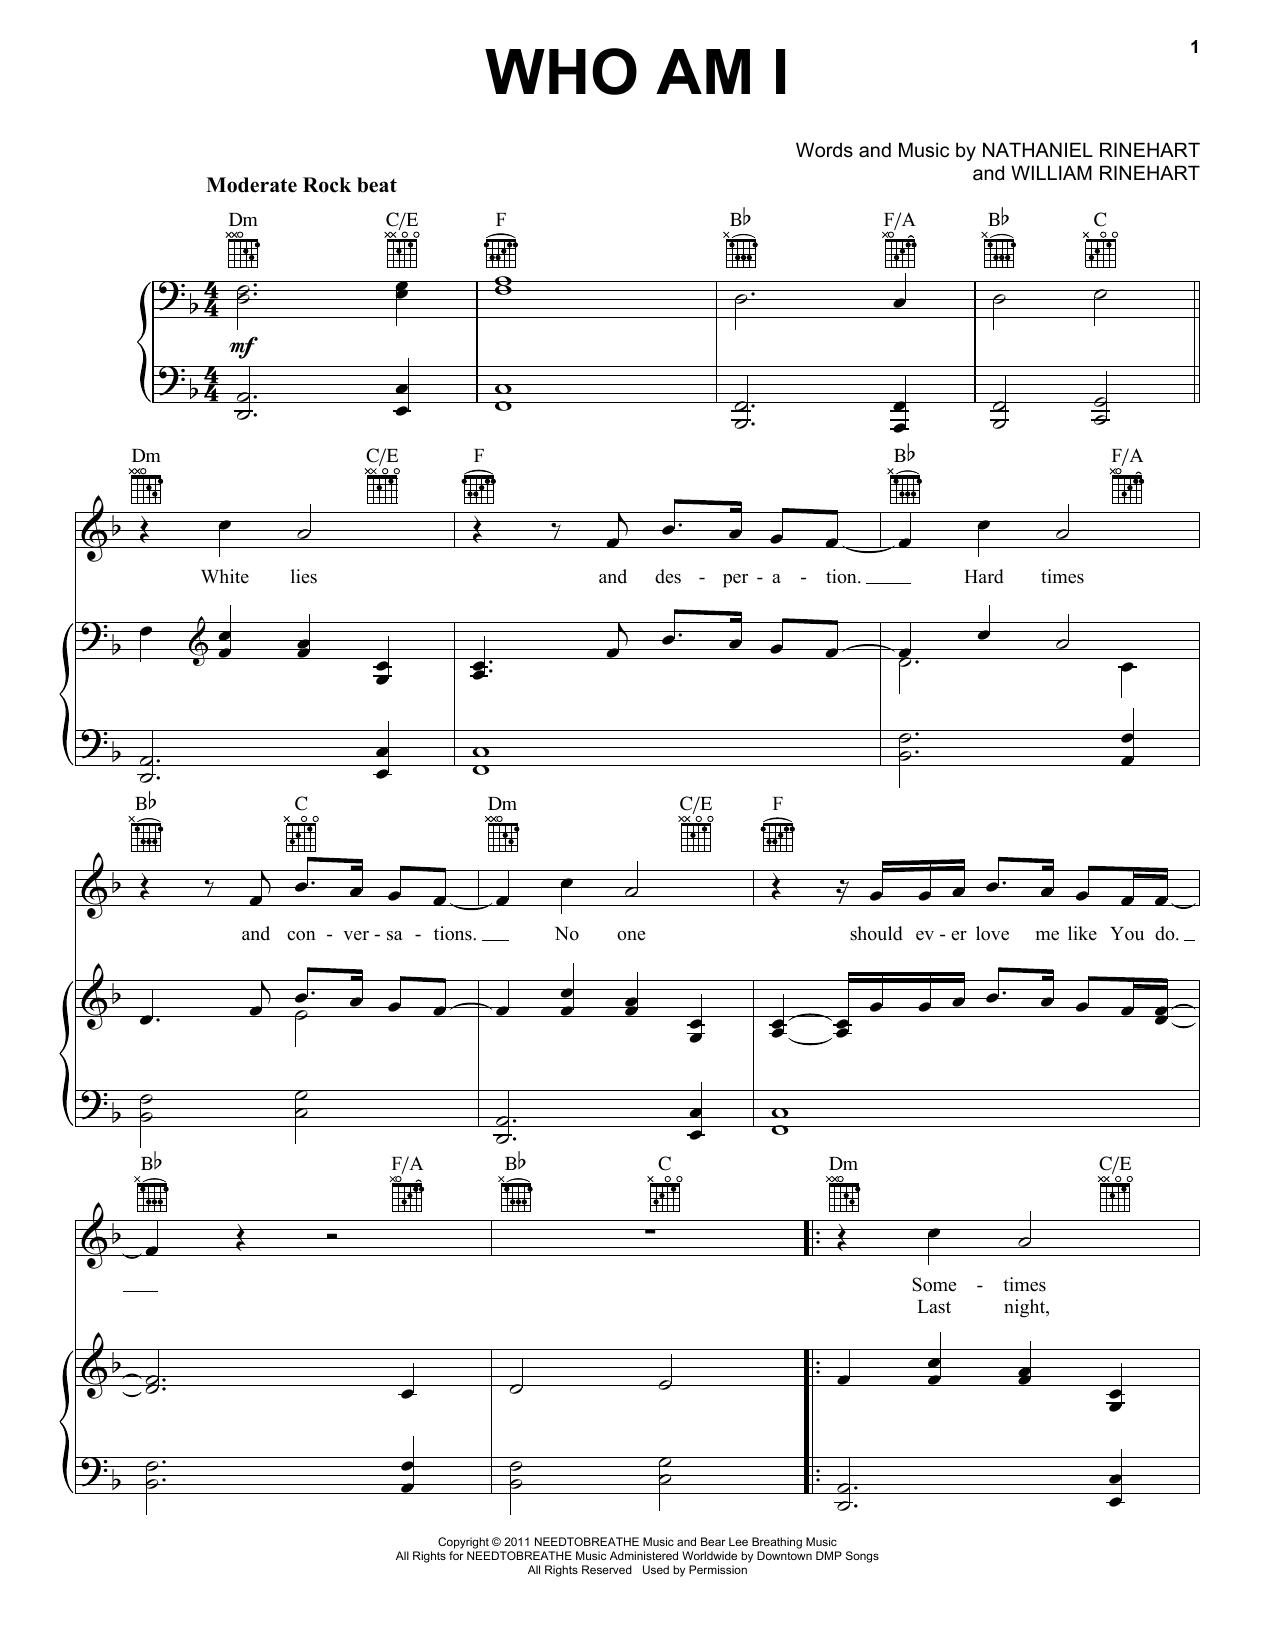 Who Am I sheet music